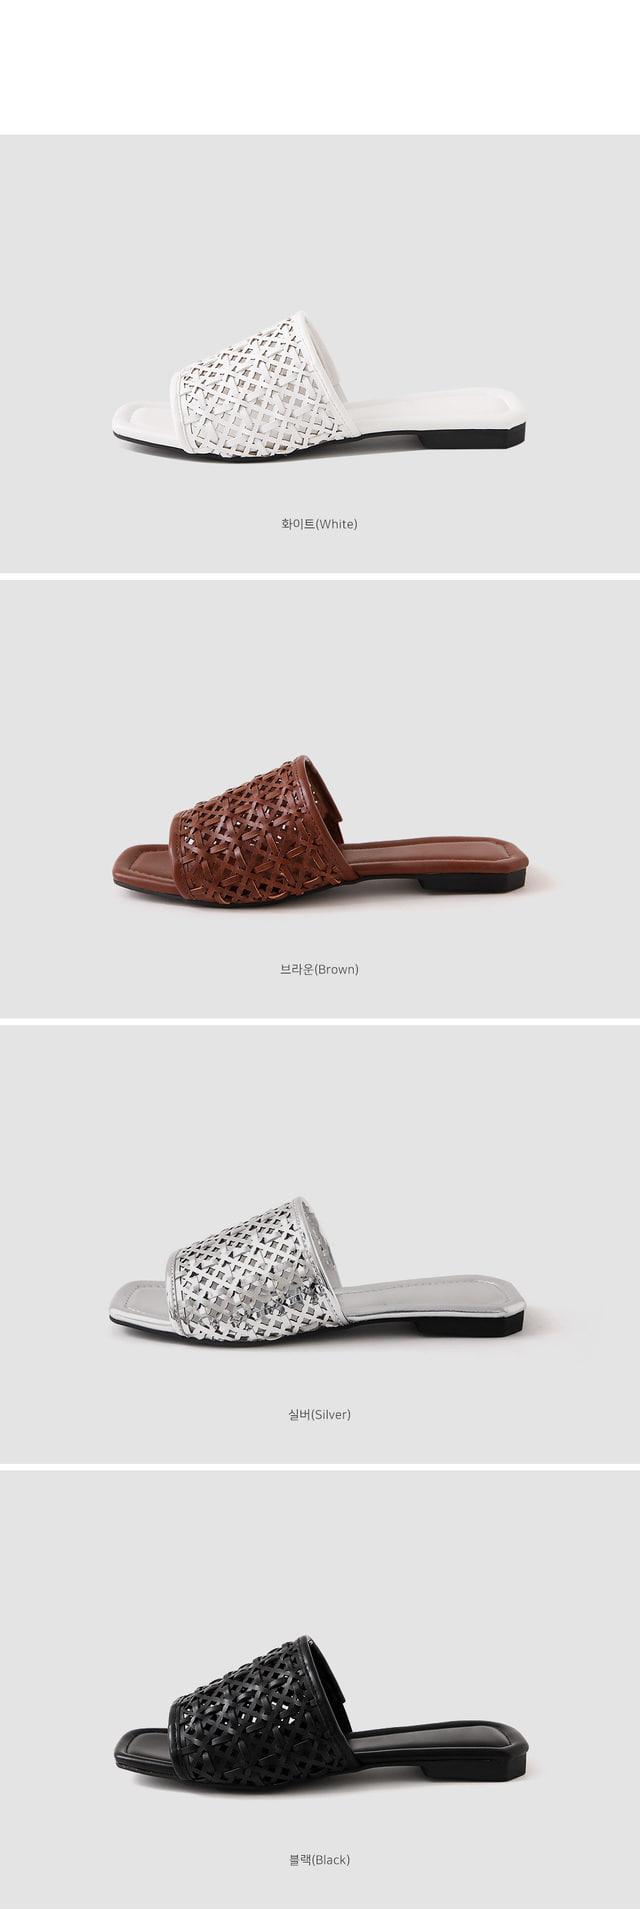 Elpo Slippers 1cm